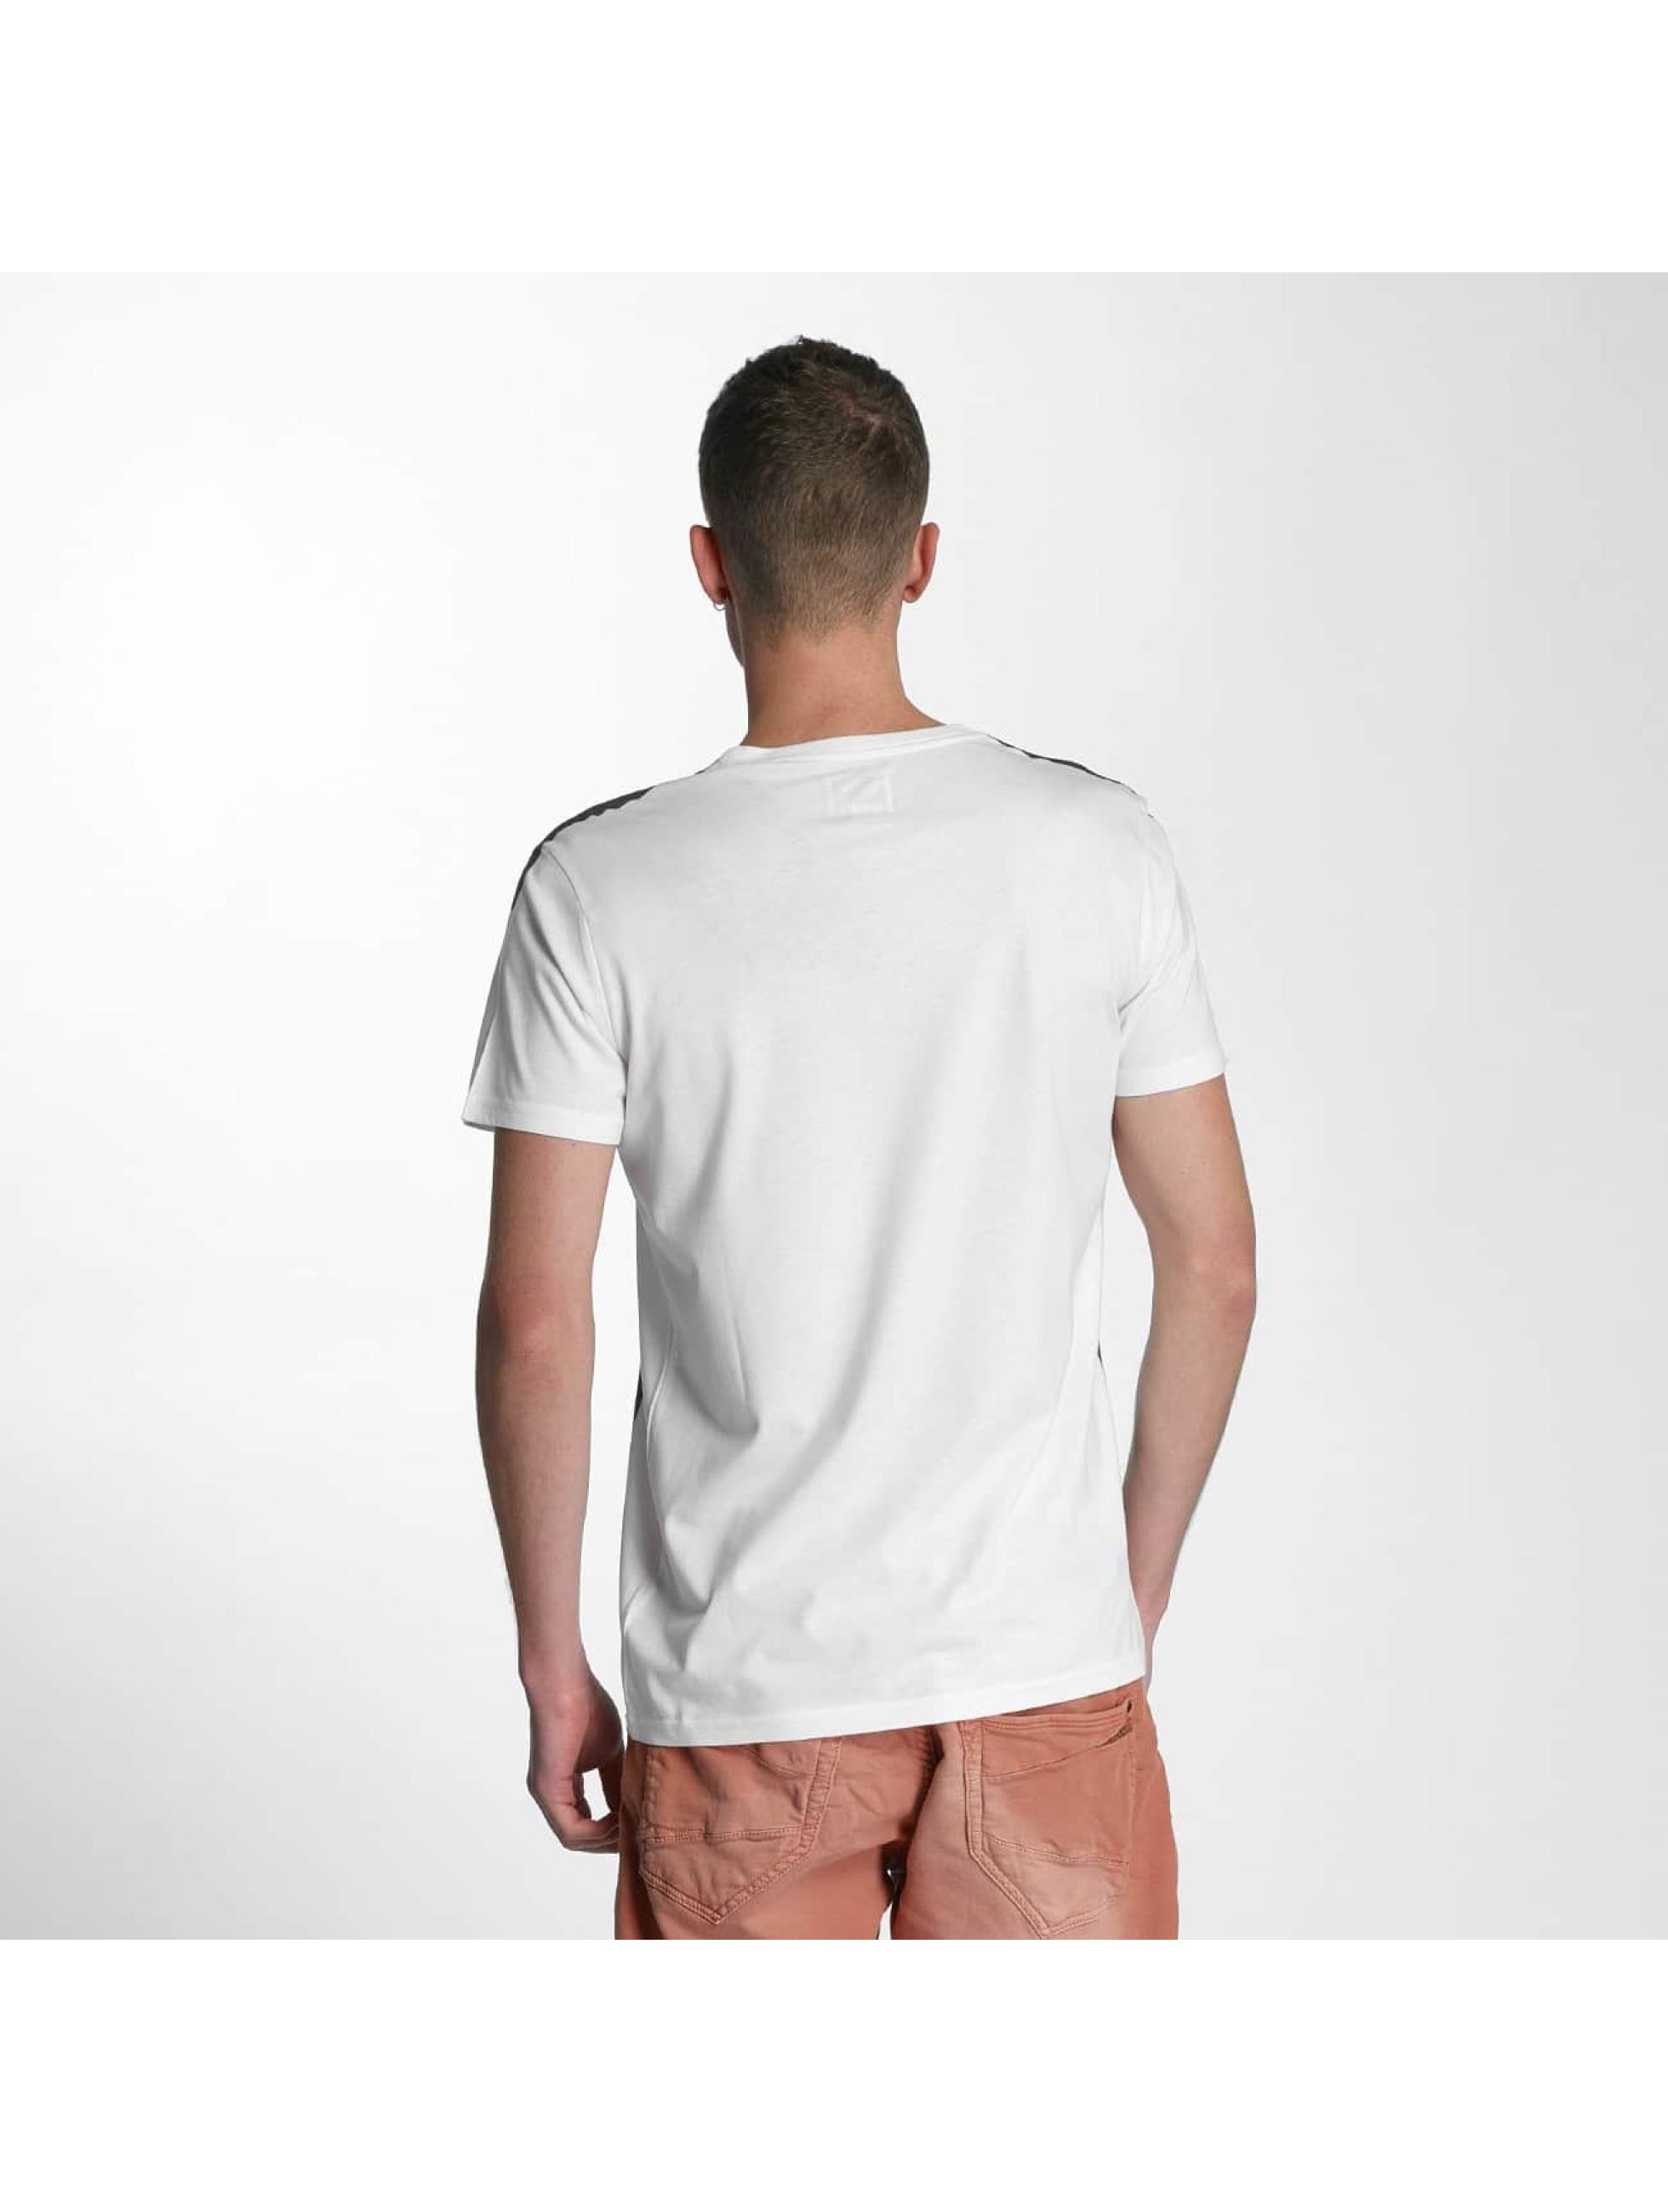 SHINE Original Camiseta Print Oversize blanco